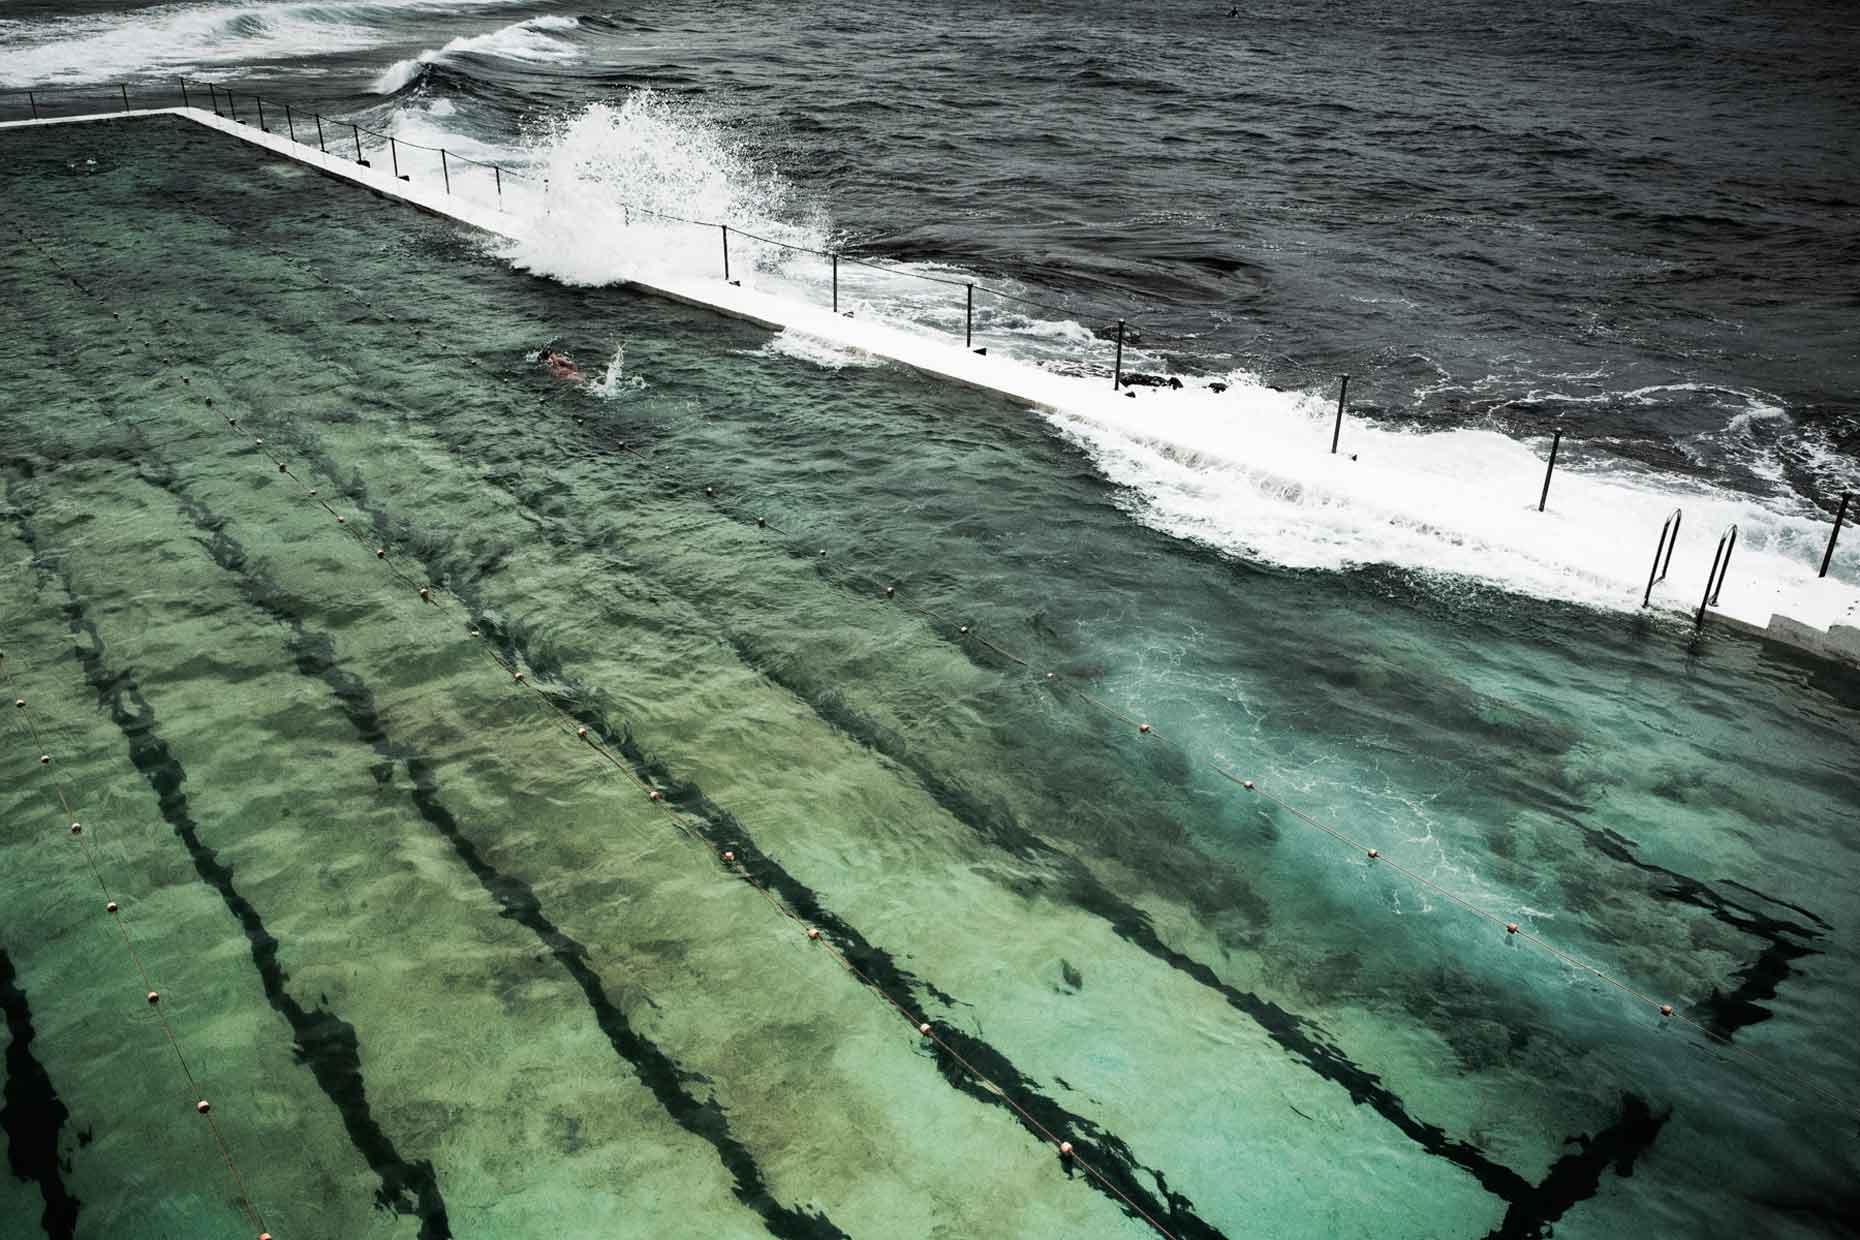 tidal-pools-australia-pim-vuik-fotografie-film-rotterdam-04.jpg